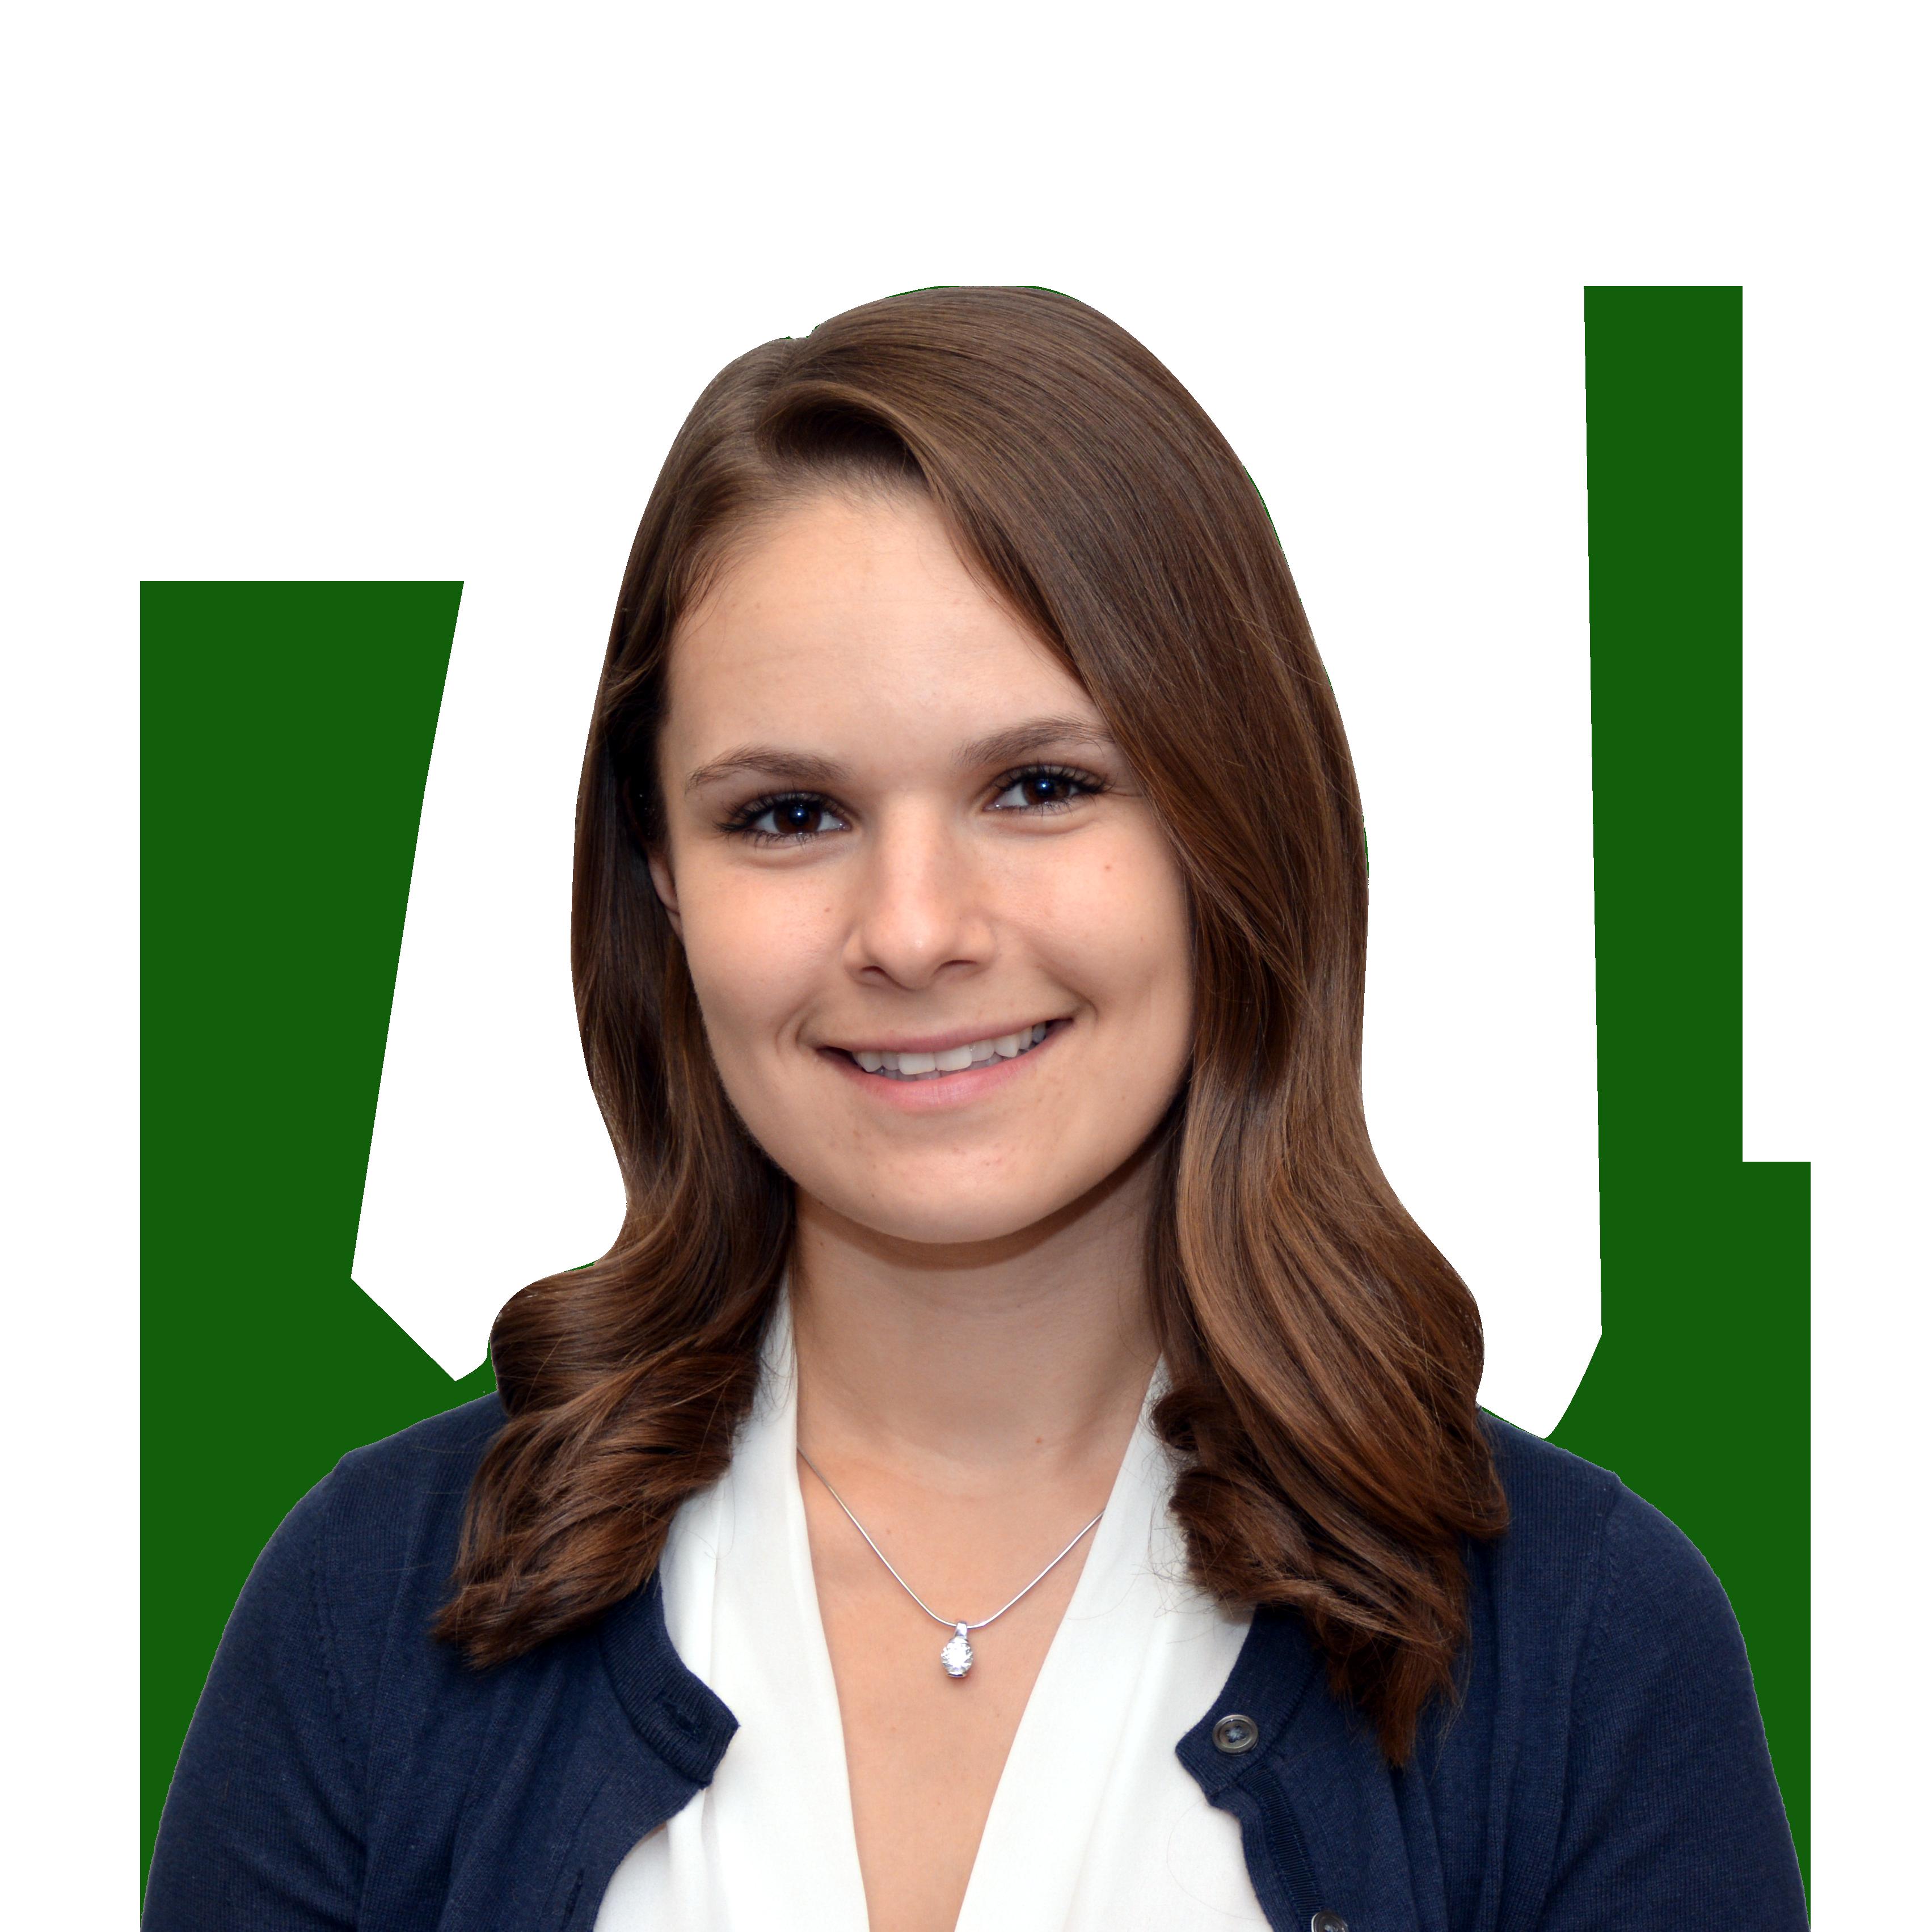 Julia Alebrand, CSE